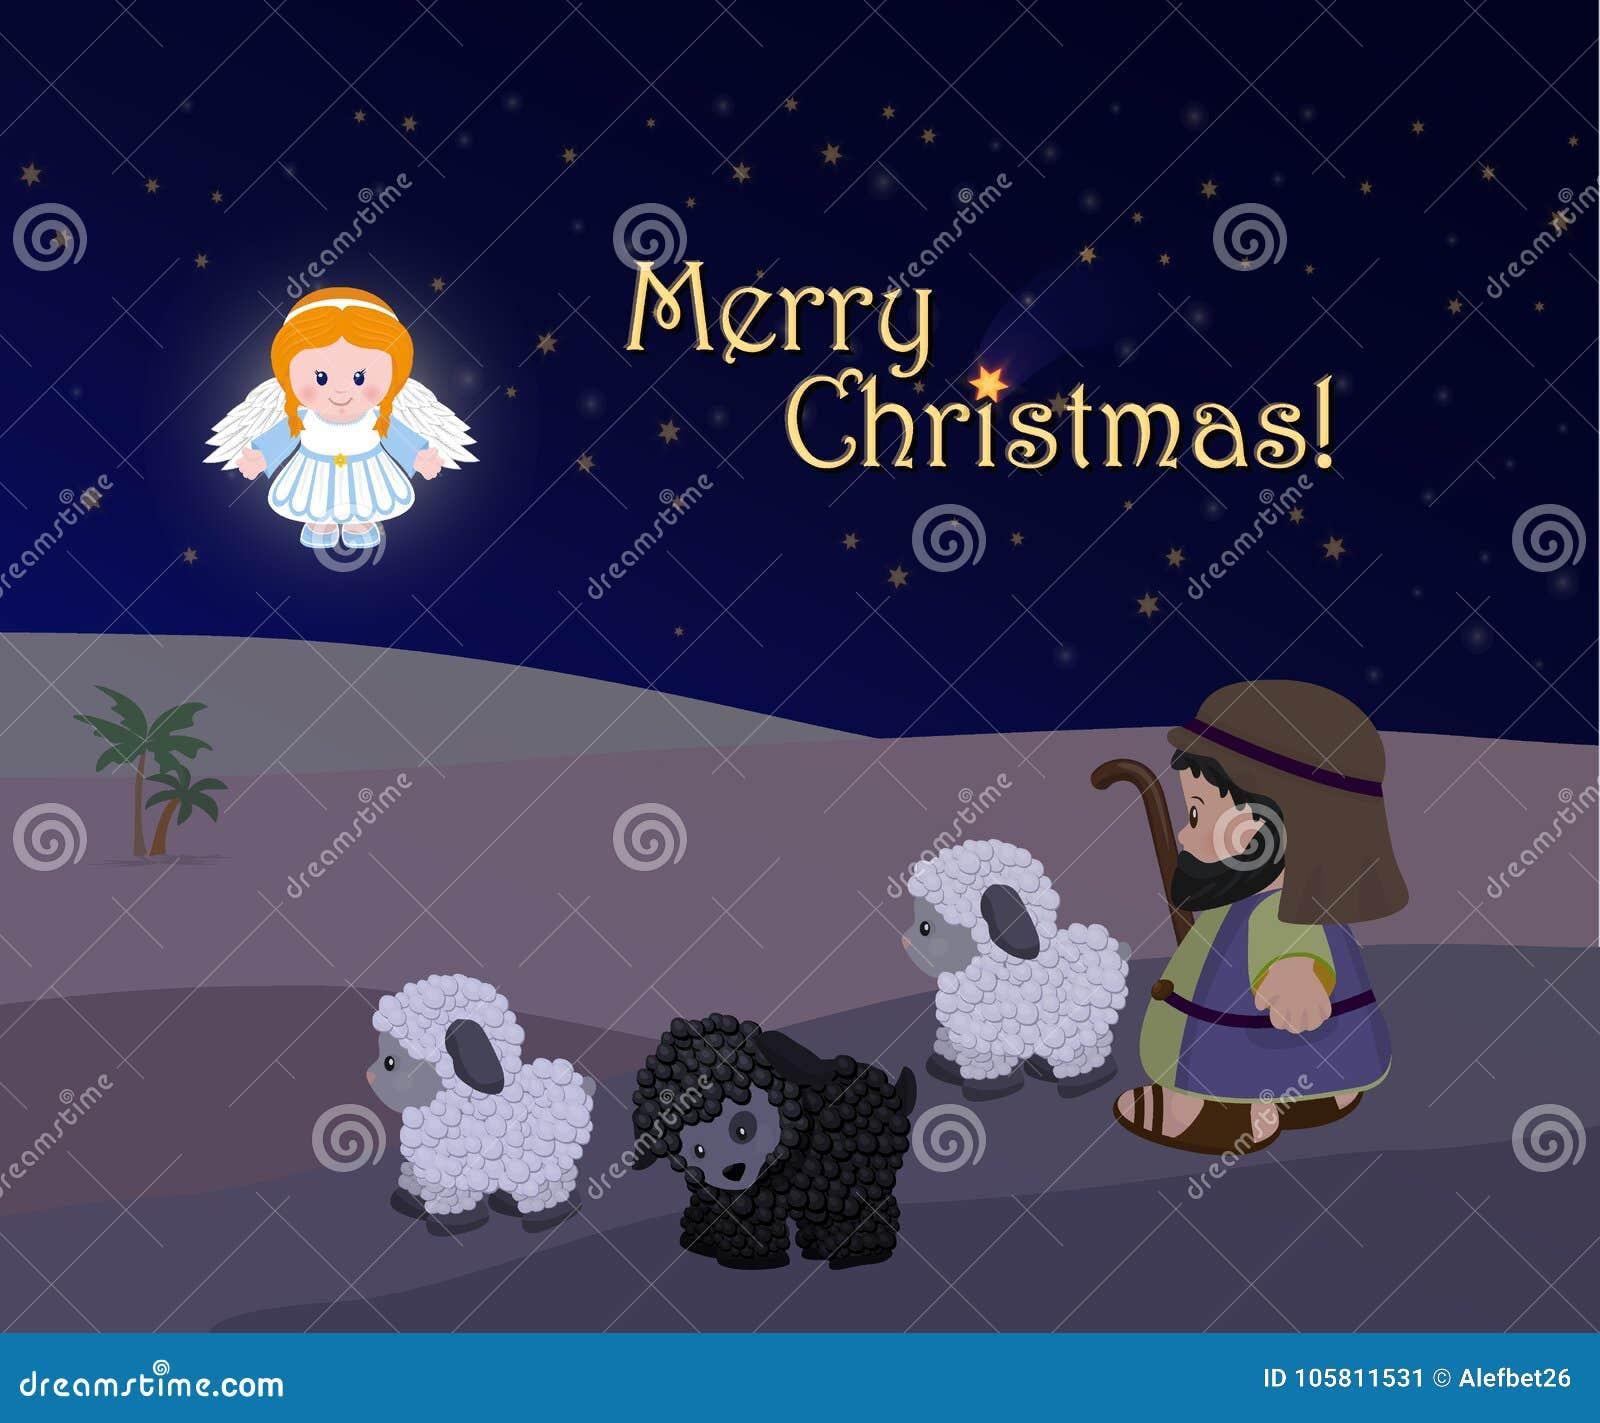 Holiday Of Merry Christmas, Nativity Scene Stock Vector ...